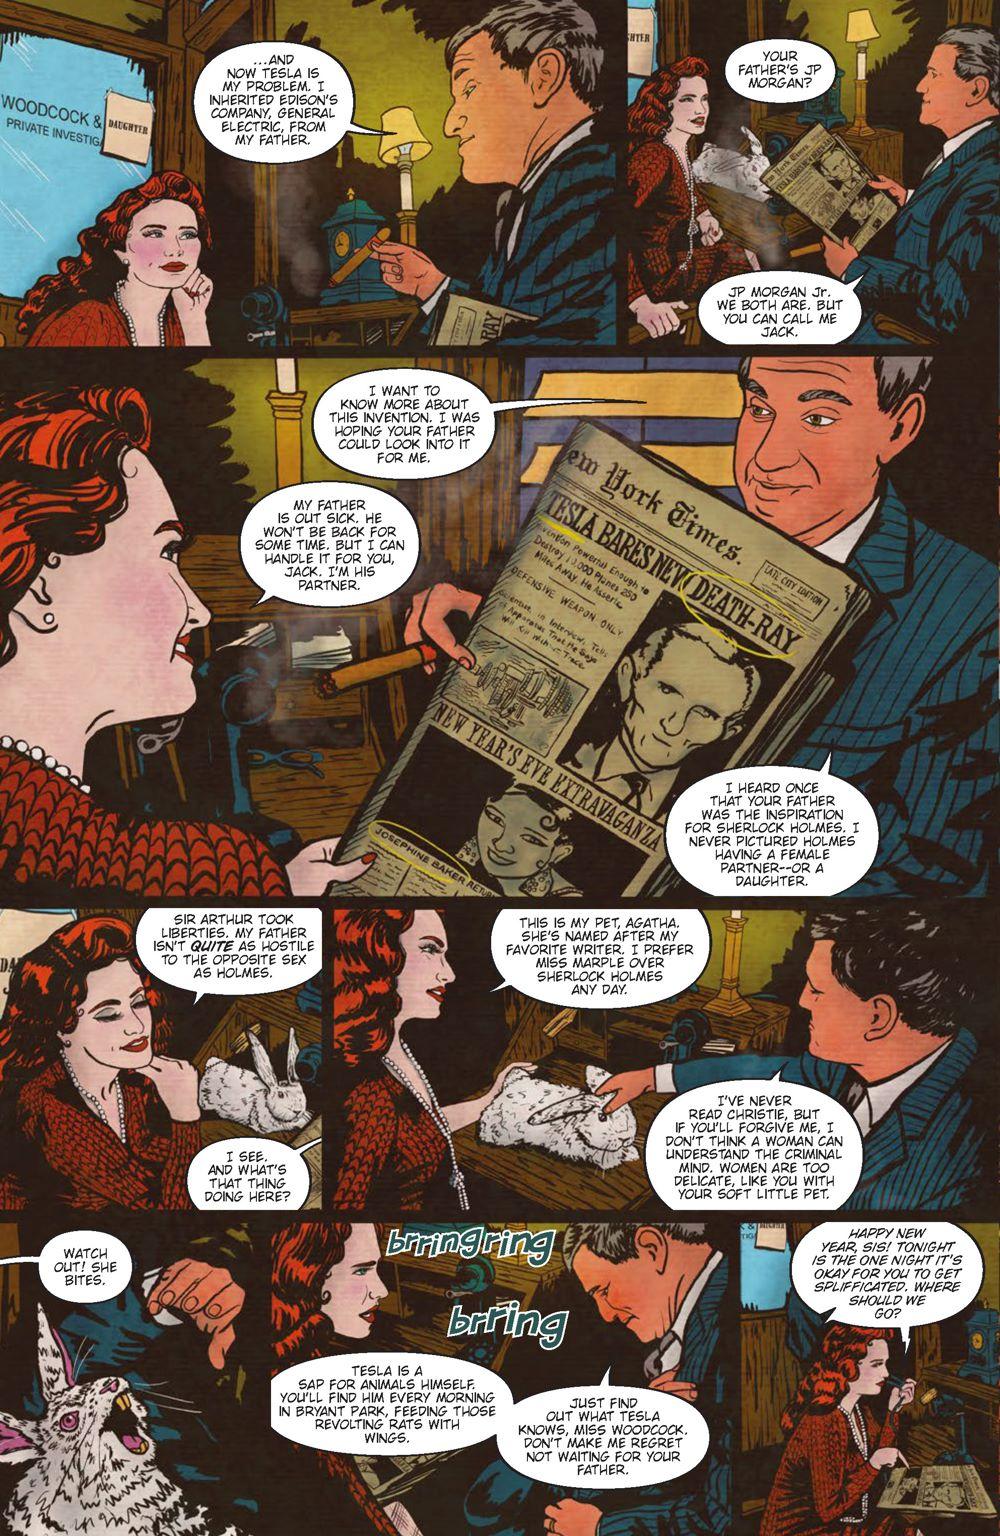 Minky-Interiors-Page_1 ComicList Previews: MINKY WOODCOCK THE GIRL WHO ELECTRIFIED TESLA #1